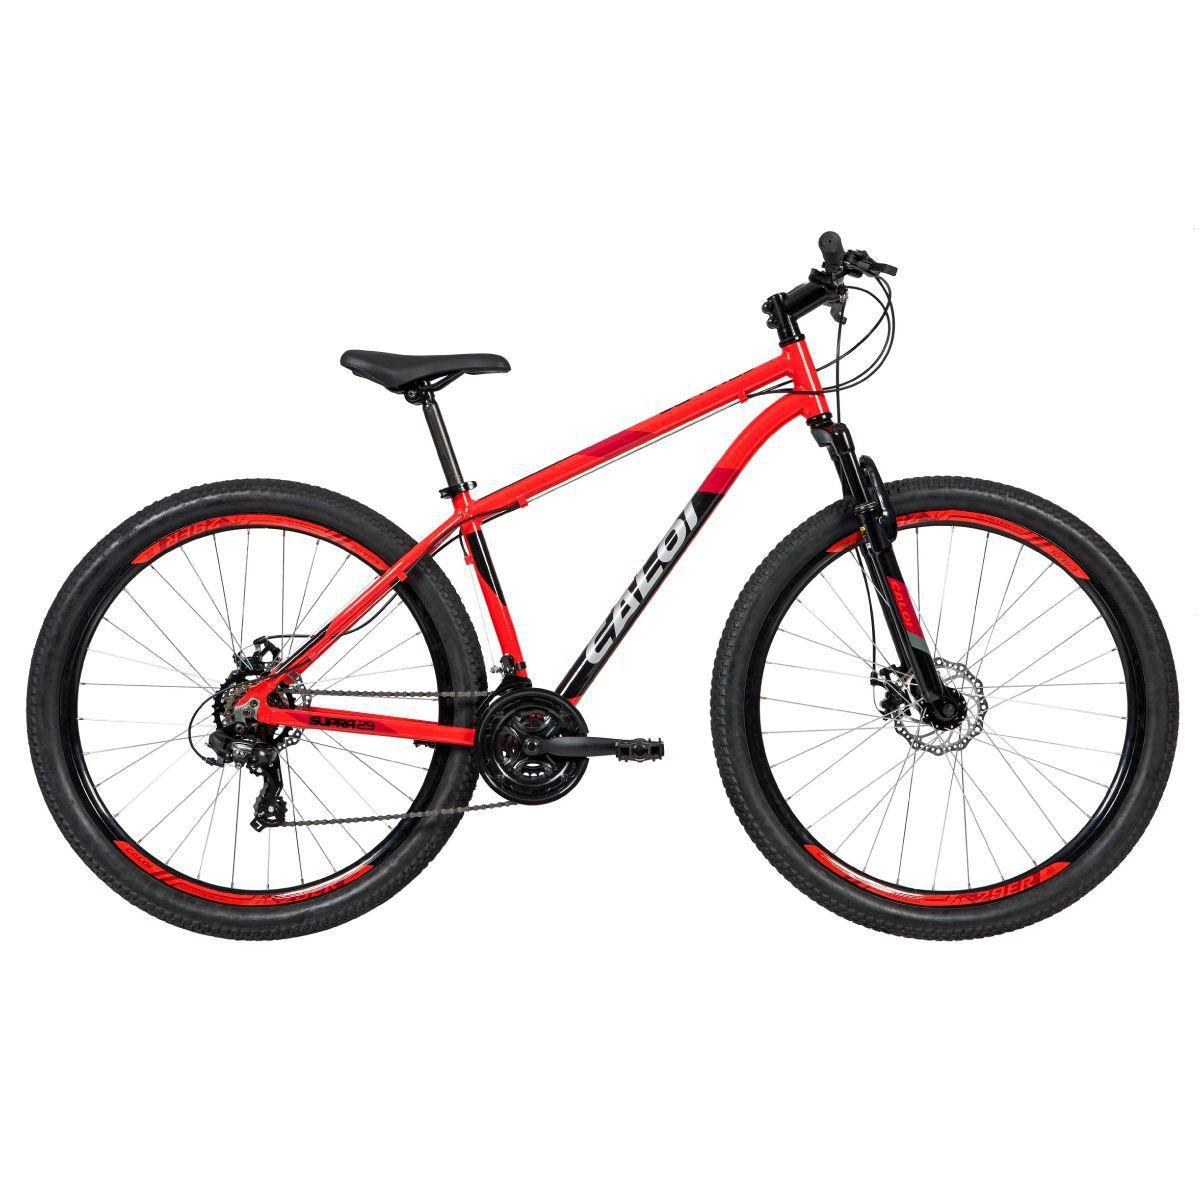 Bicicleta Caloi Supra 2020 21v Aro 29